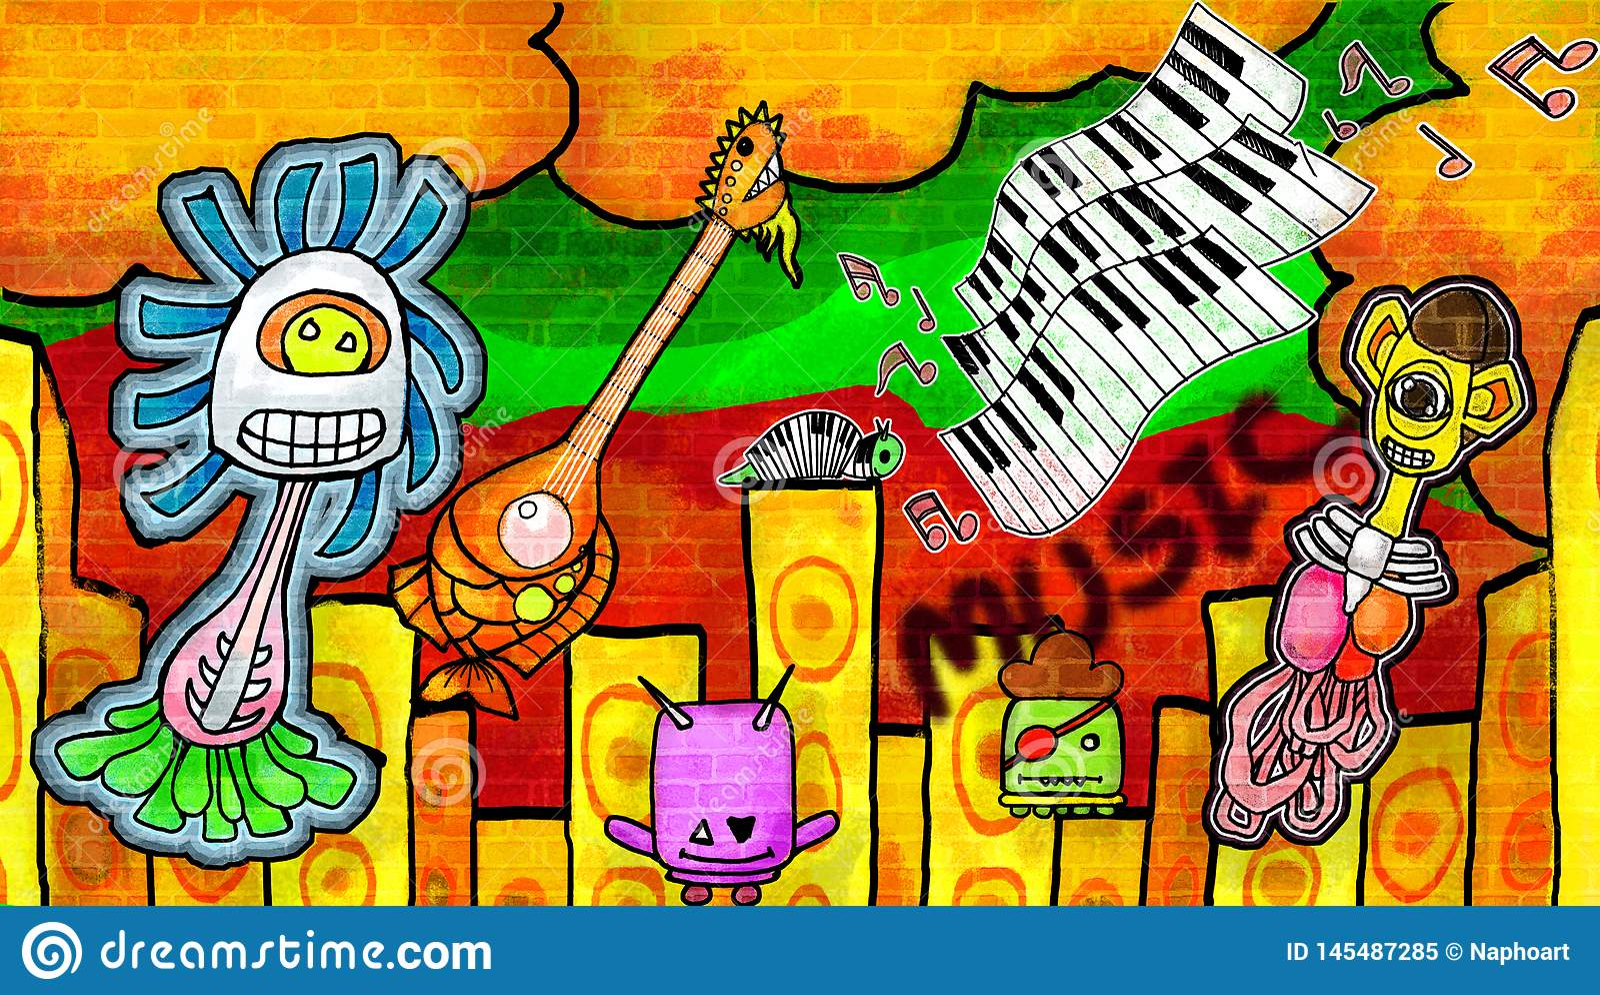 L?chelnde Monster, welche die Musik die bunte Farbe Wand genie?en